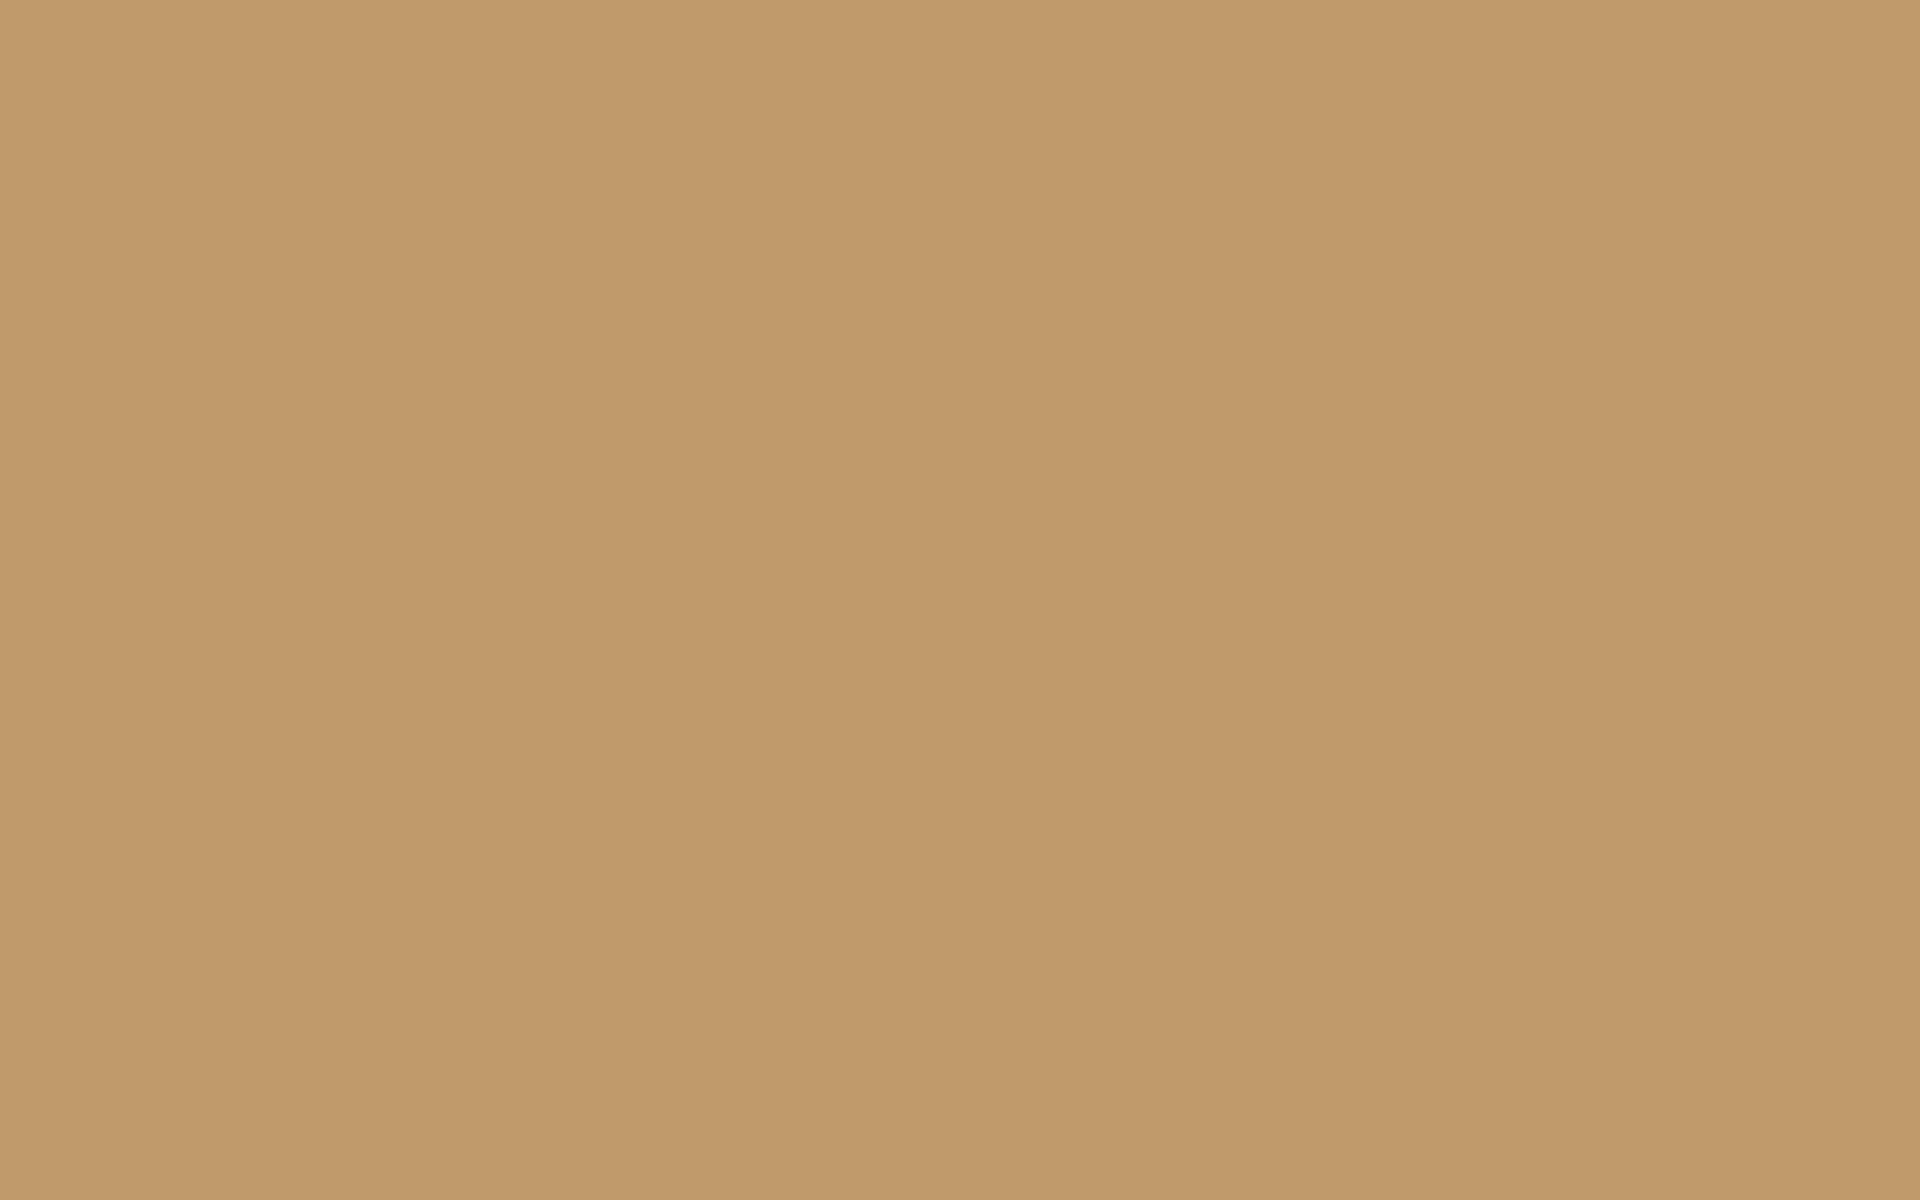 1920x1200 Desert Solid Color Background